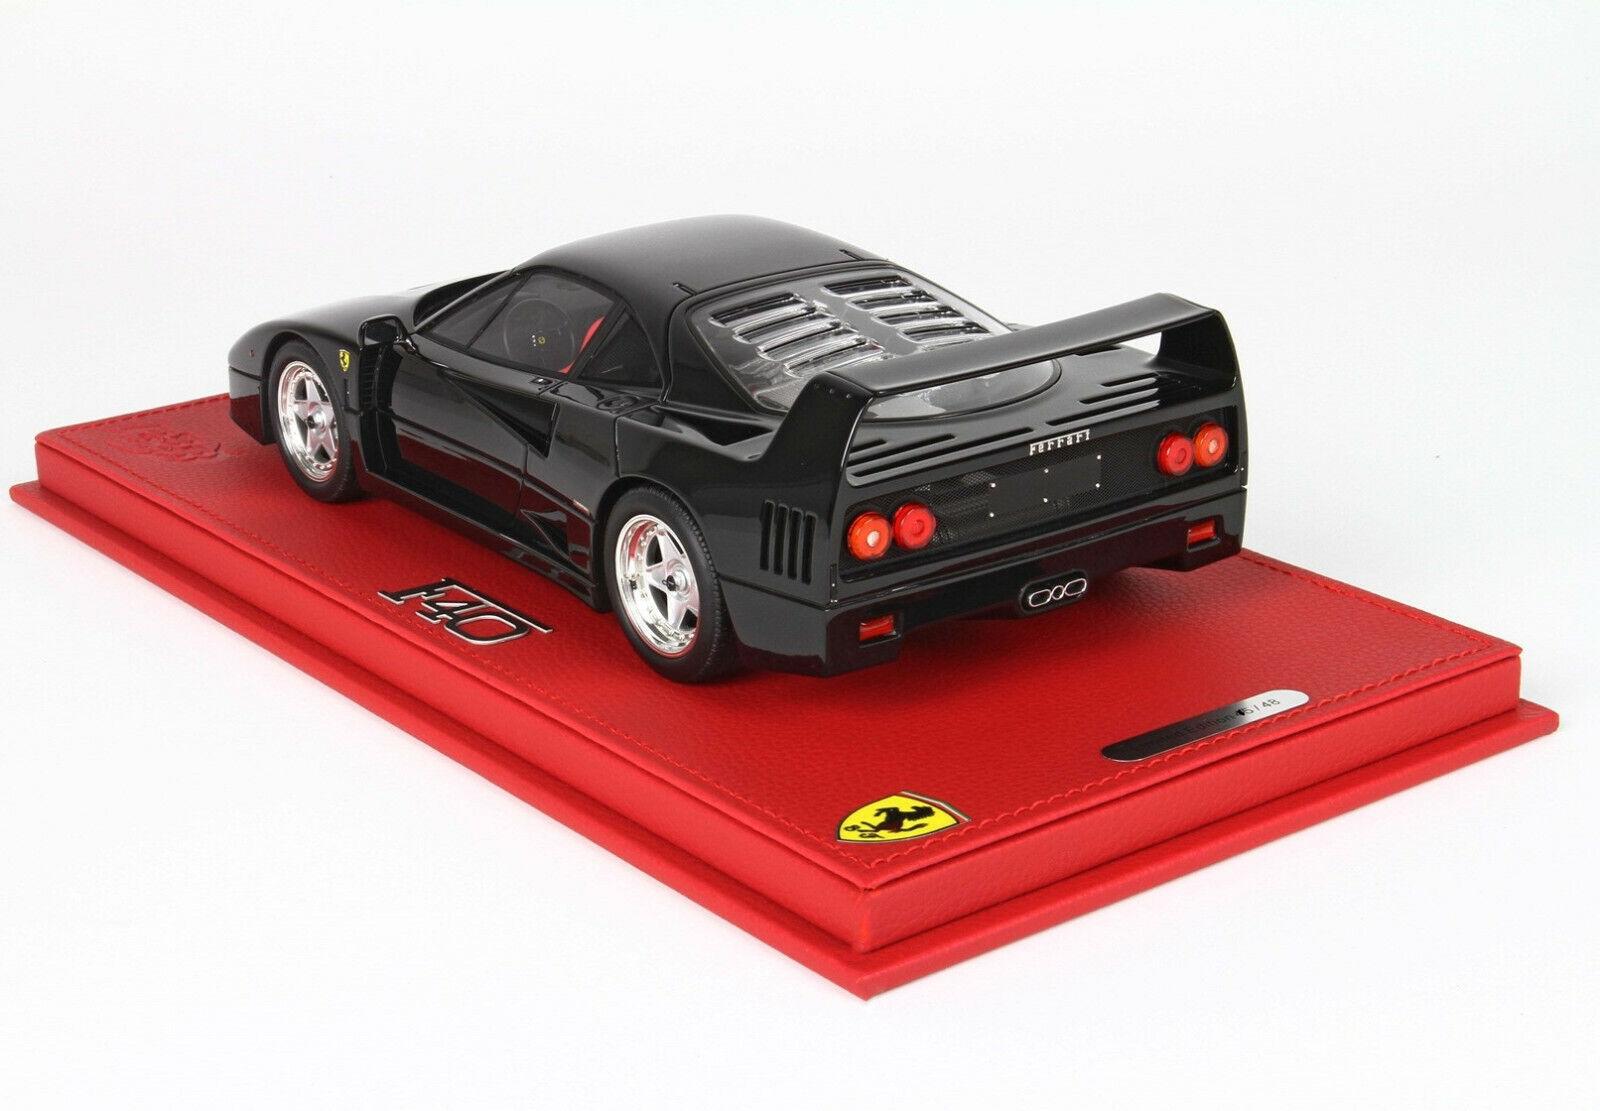 Ferrari F40 1987 1 18 schwarz Pastello lim.ed.35 48 pcs P18151C BBR NO DISPLAY